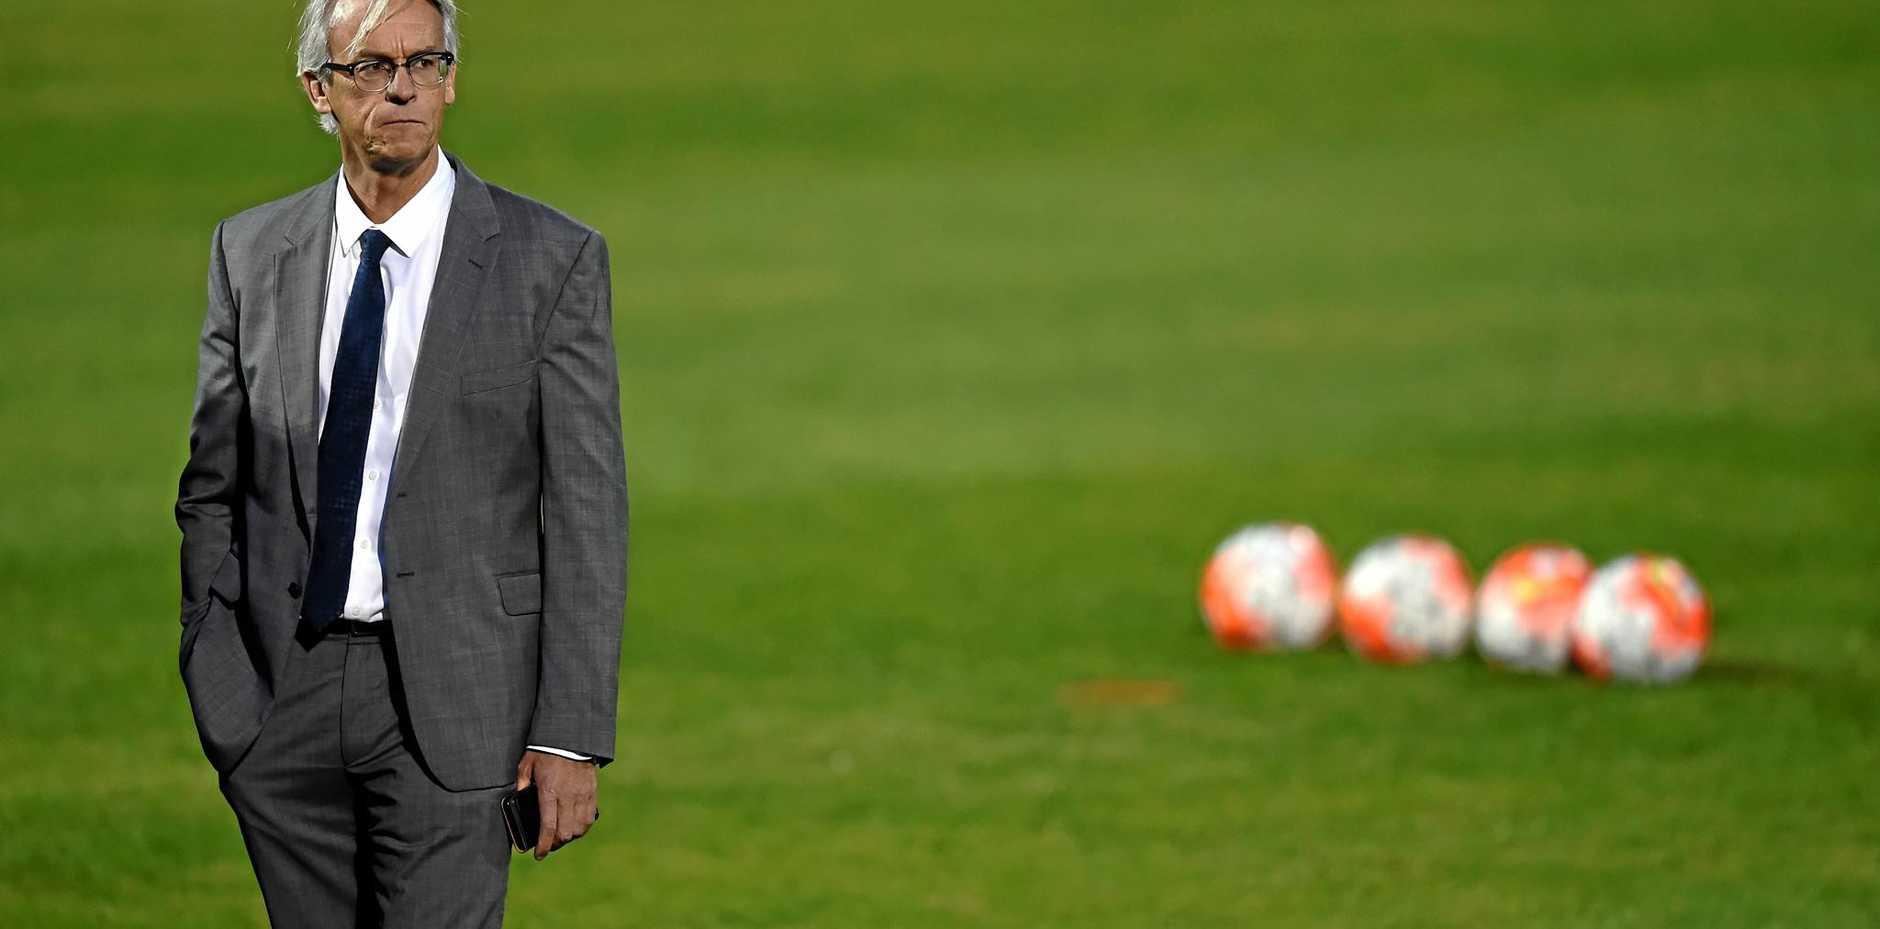 FFA chief executive David Gallop at a Socceroos training session.